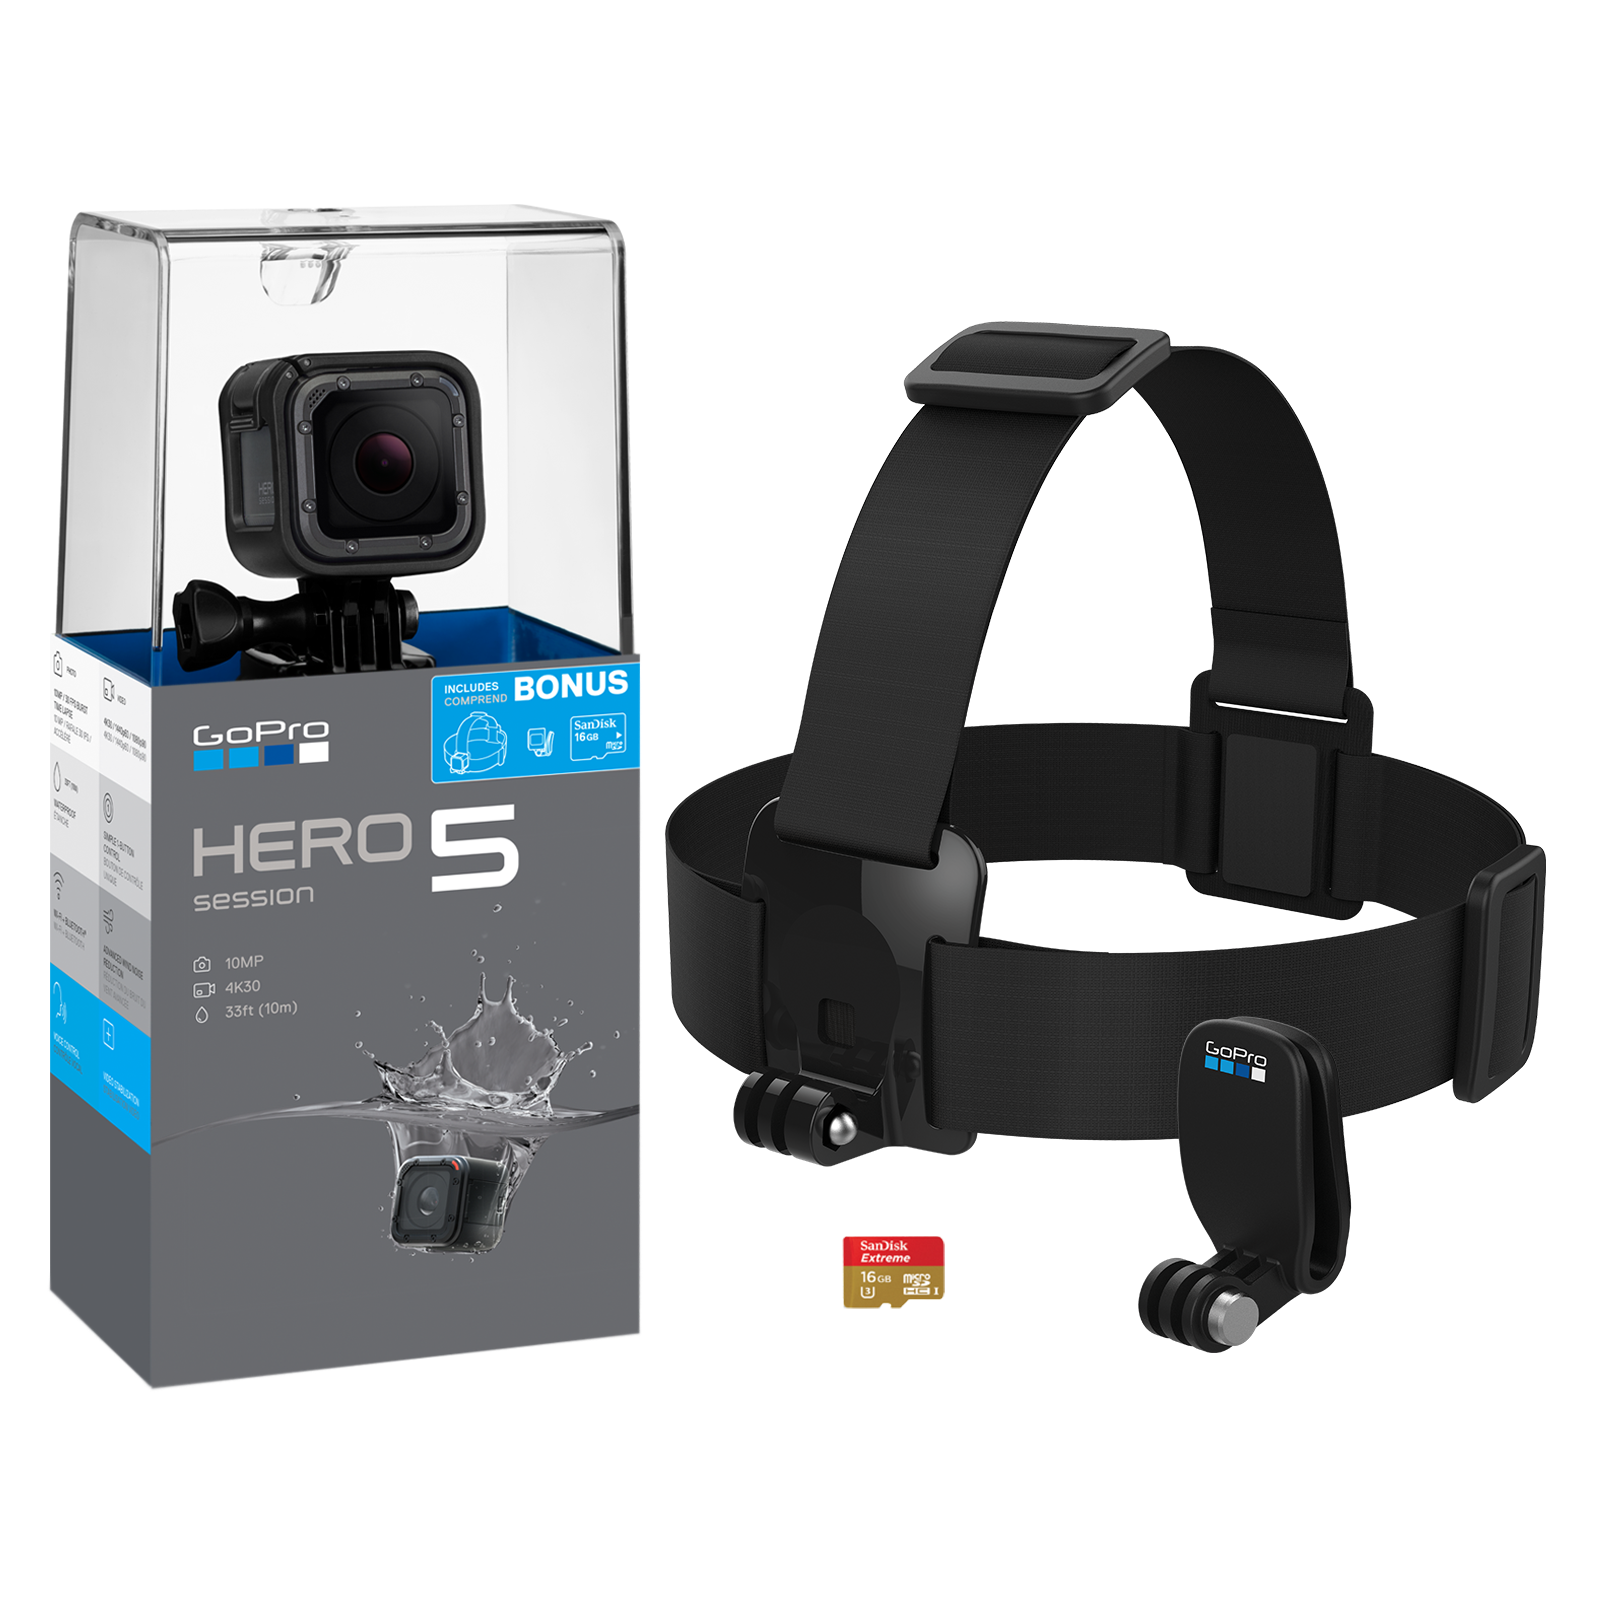 GoPro HERO5 Session Bundle